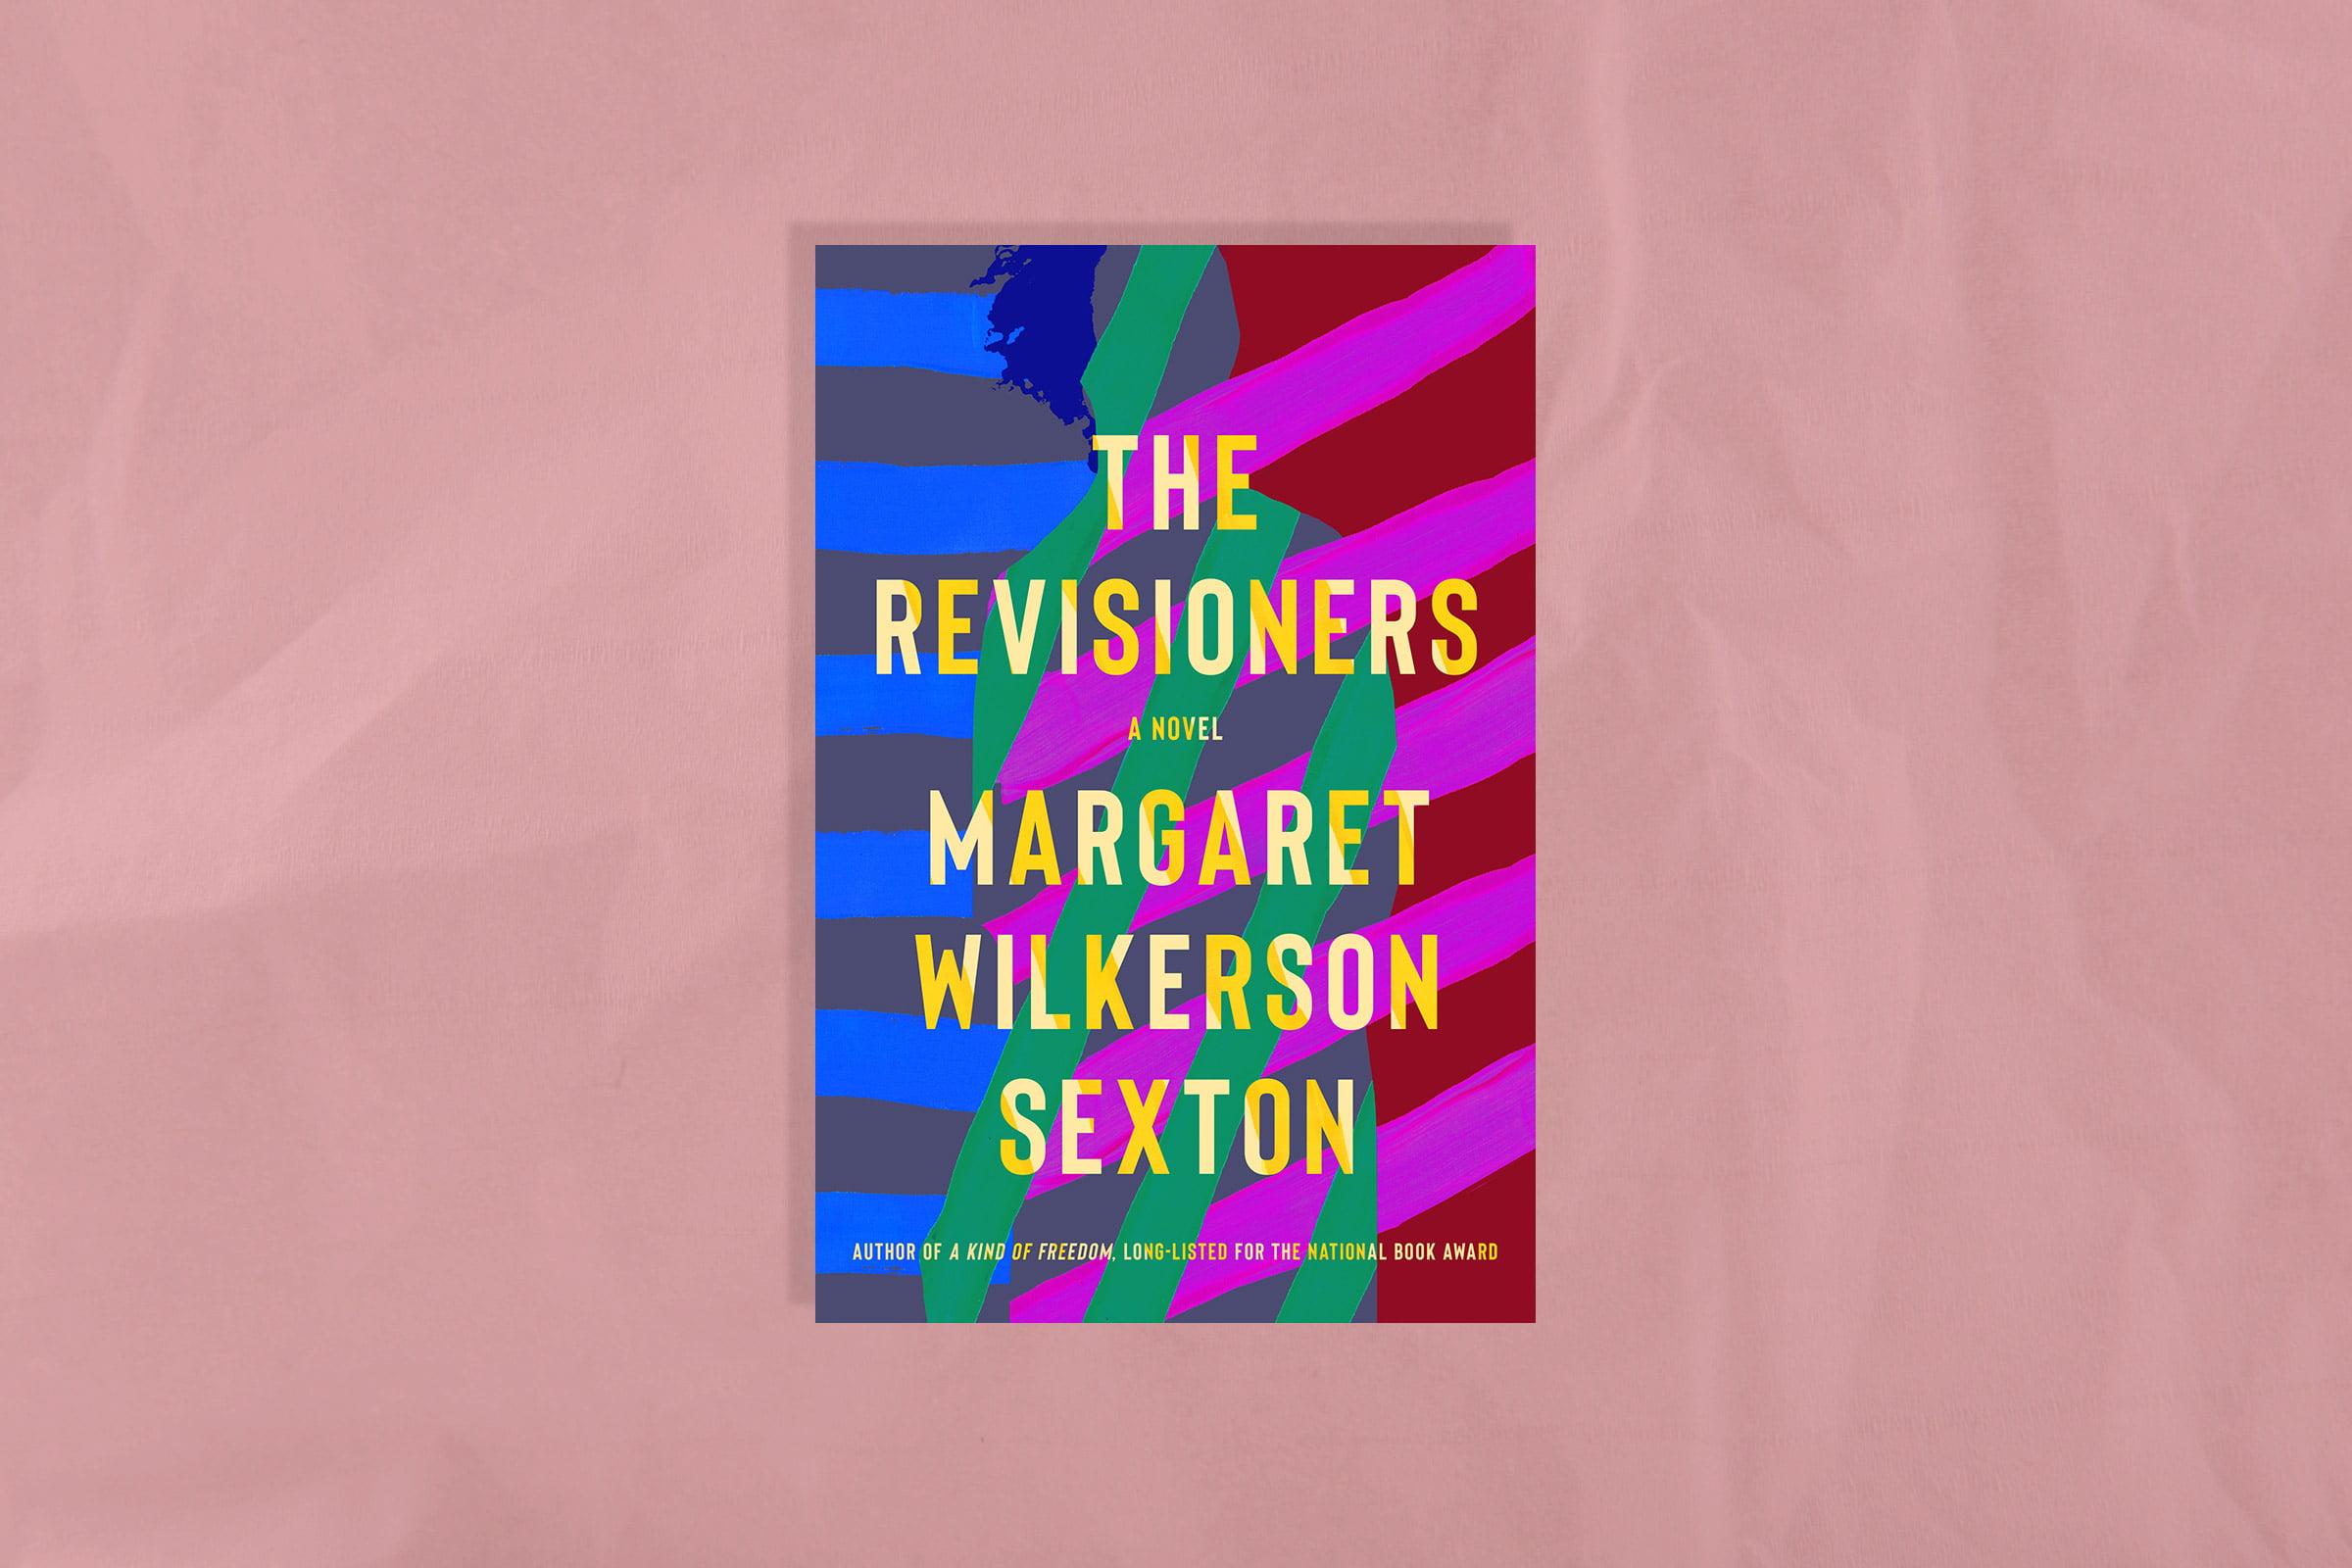 کتاب تجدید نظر کنندگان از مارگارت ویلکرسون سکستون ( The Revisioners: A Novel )